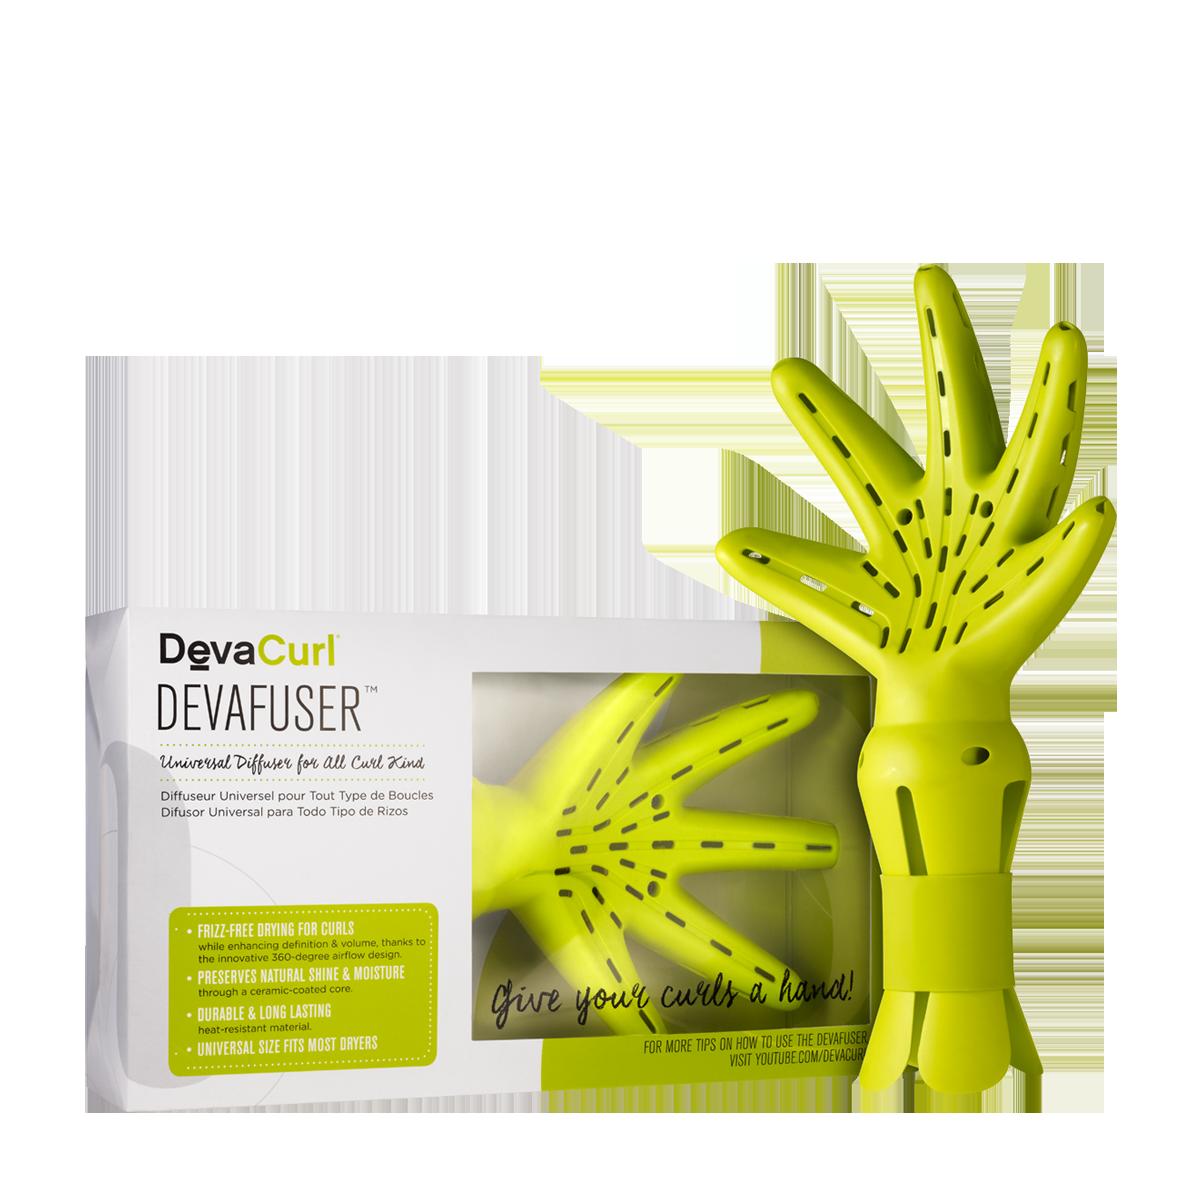 Meet DevaCurl's New and Improved DevaFuser